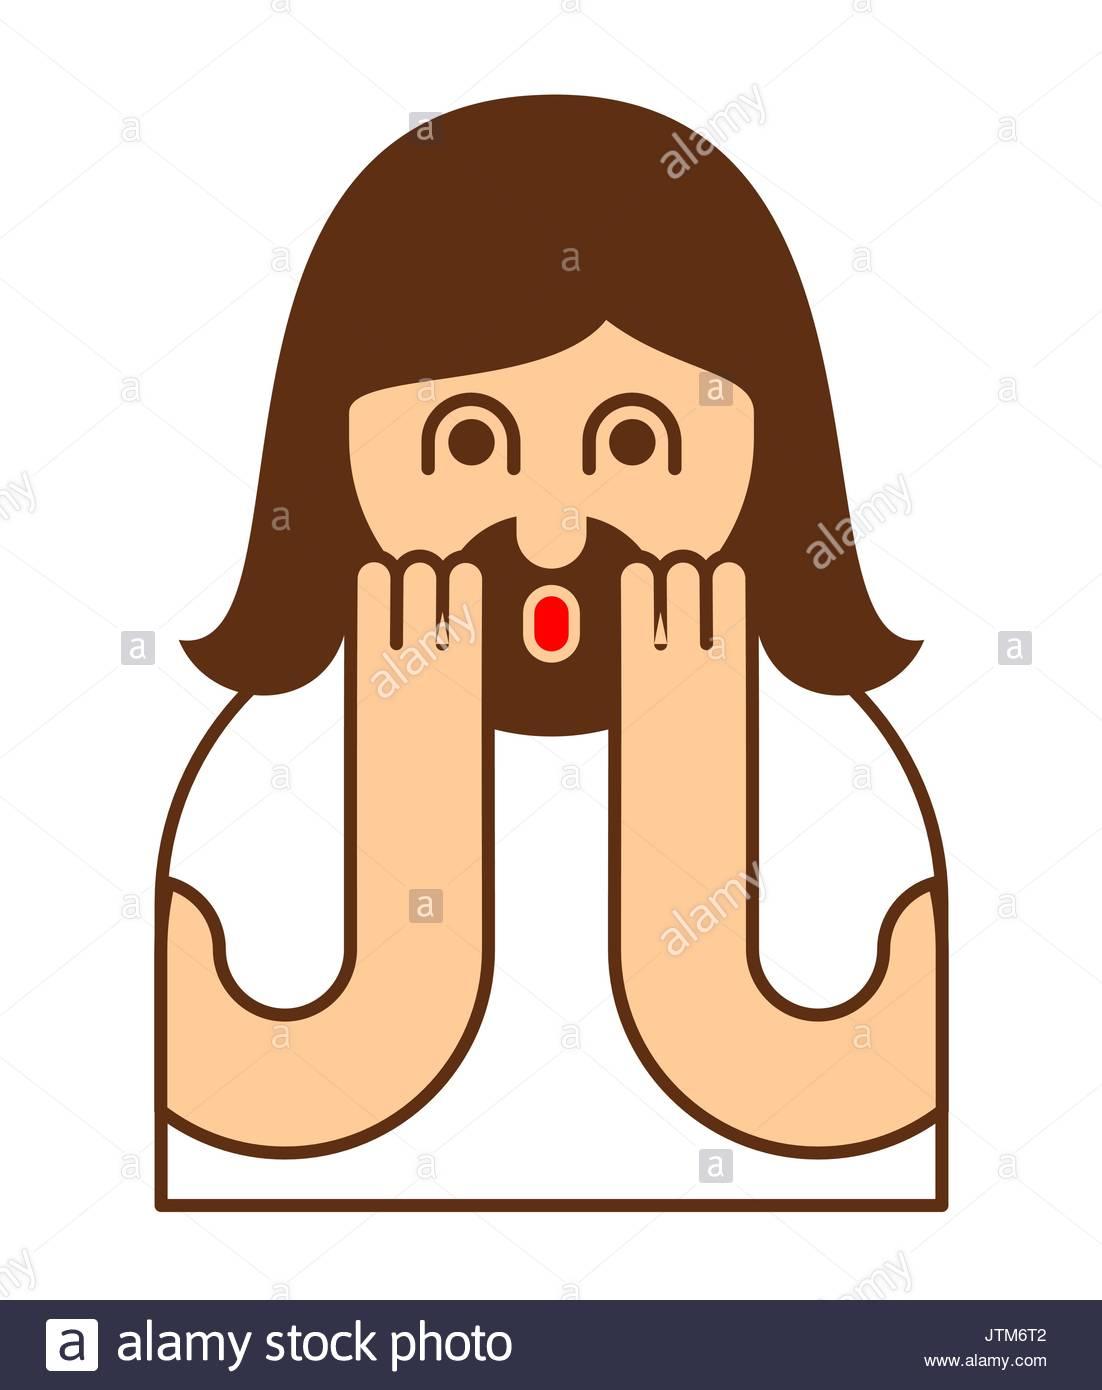 Oh My God Jesus Emotion Omg Christos Emoji Exclamation